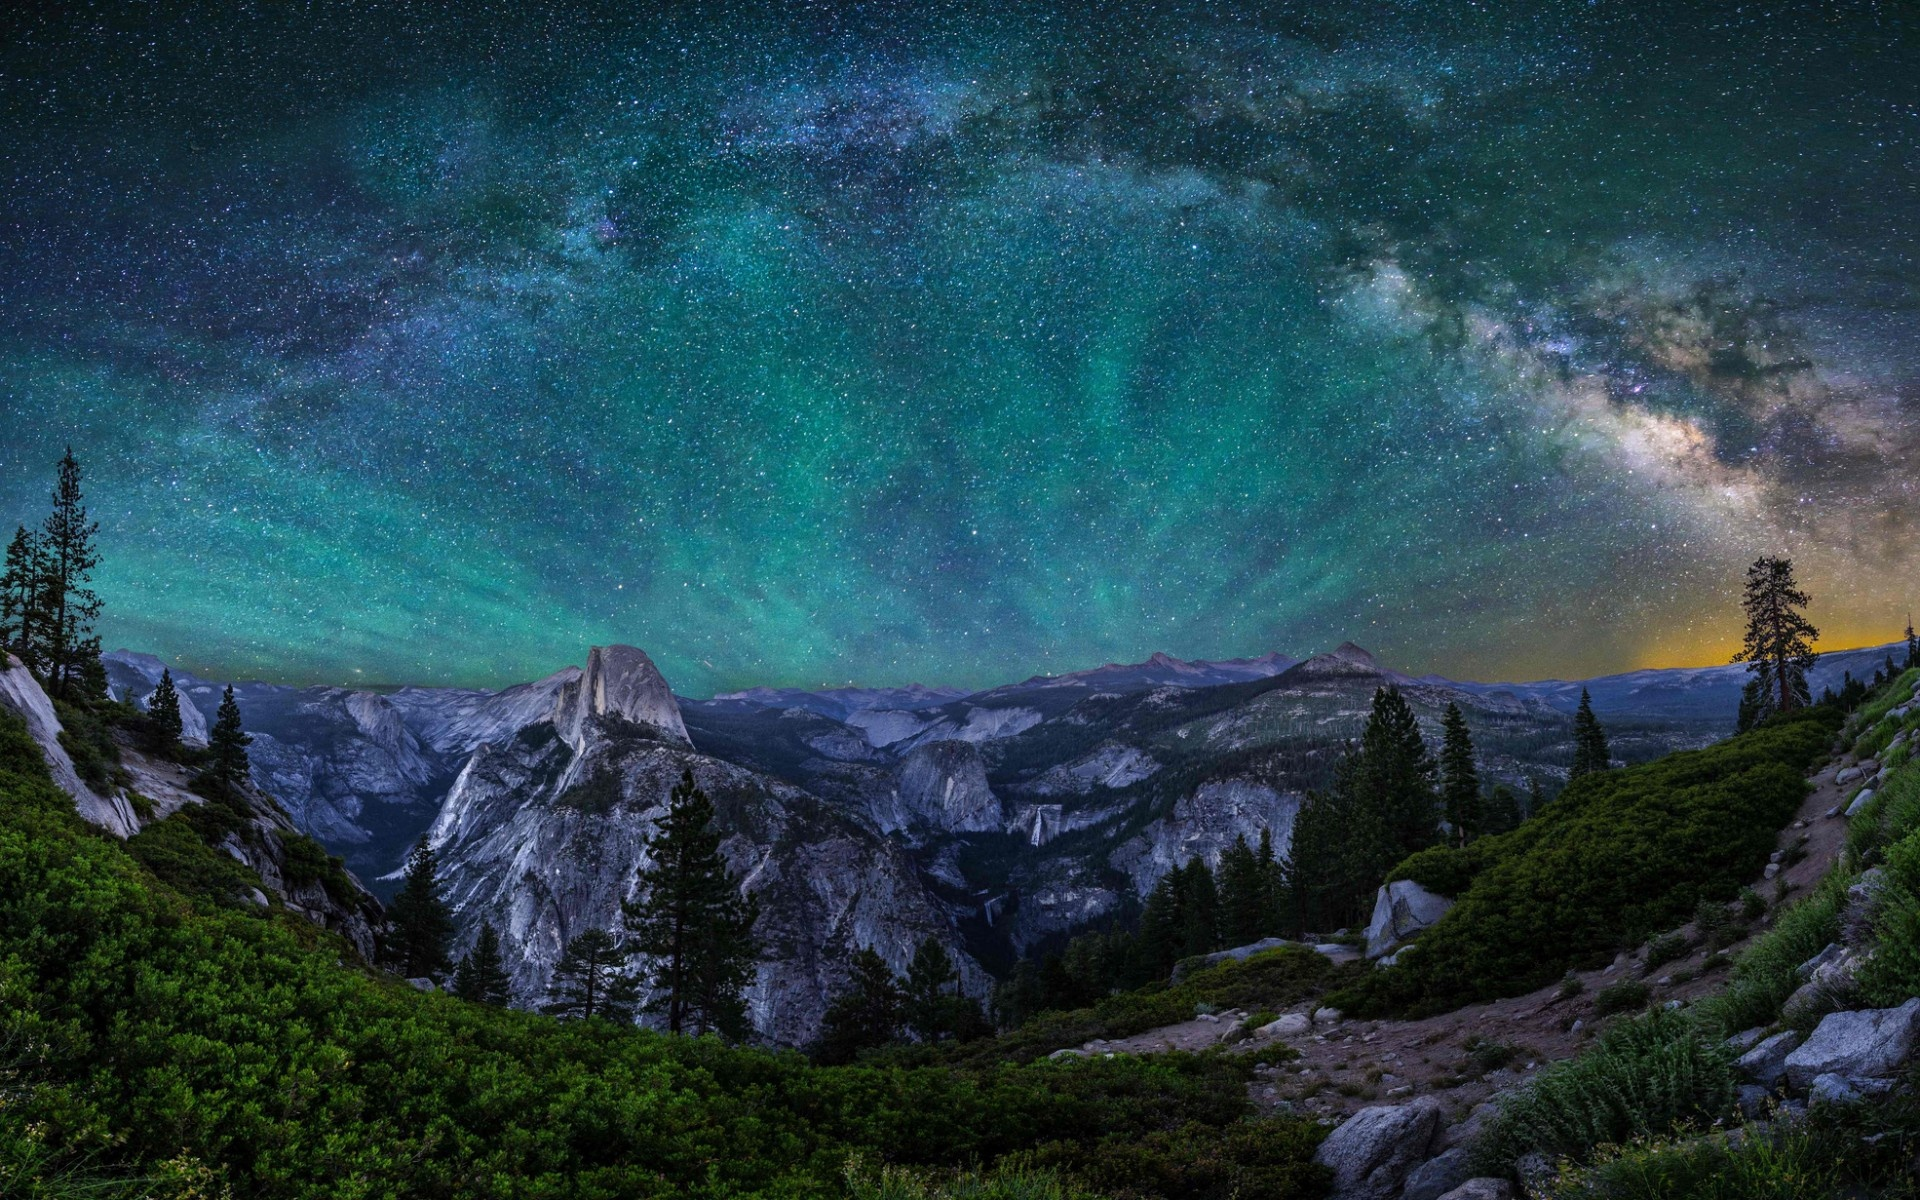 Wallpaper USA California Yosemite National Park mountains night 1920x1200